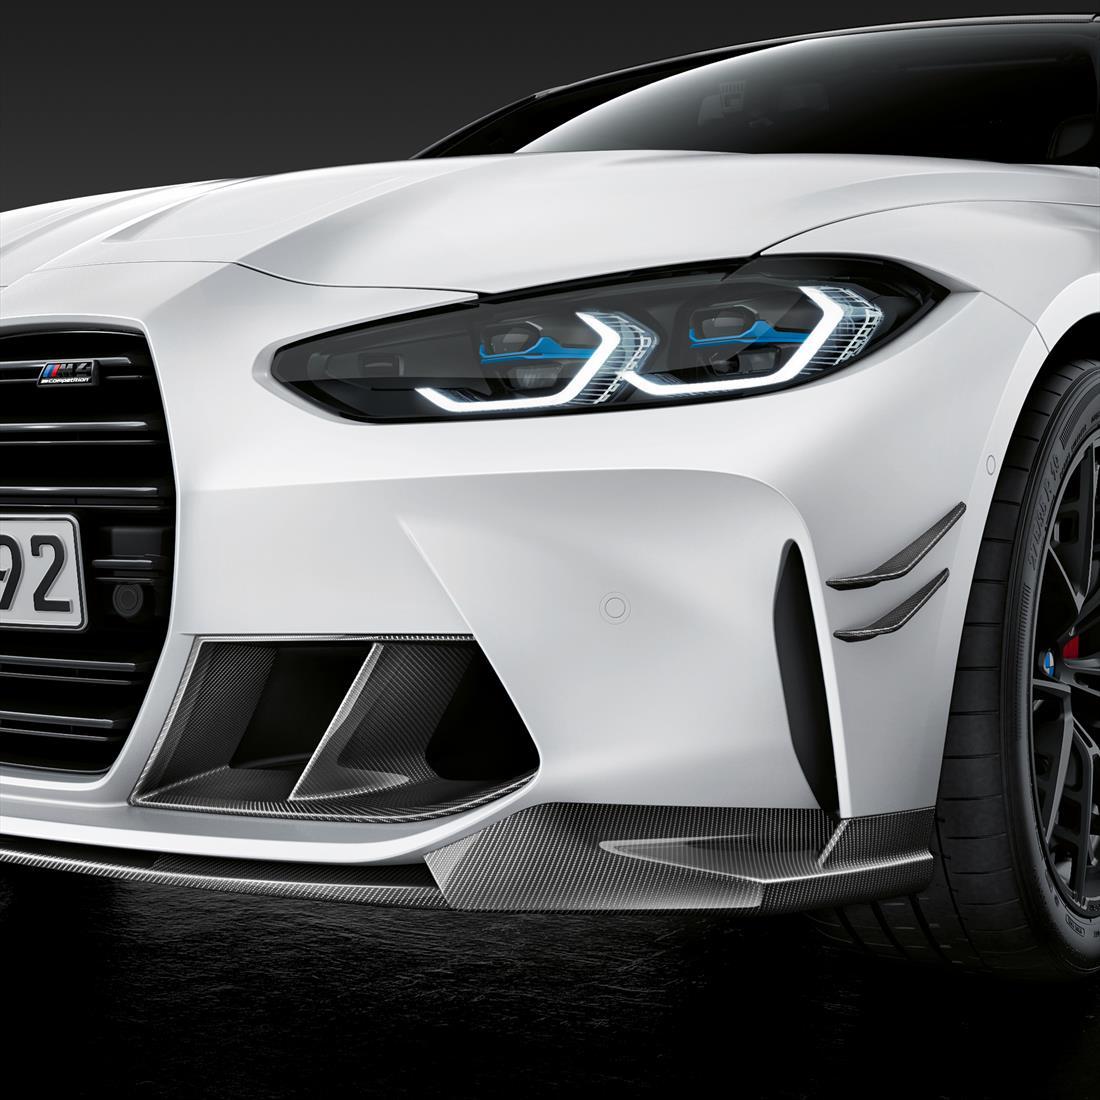 BMW M Performance Front Attachment in Carbon Fiber